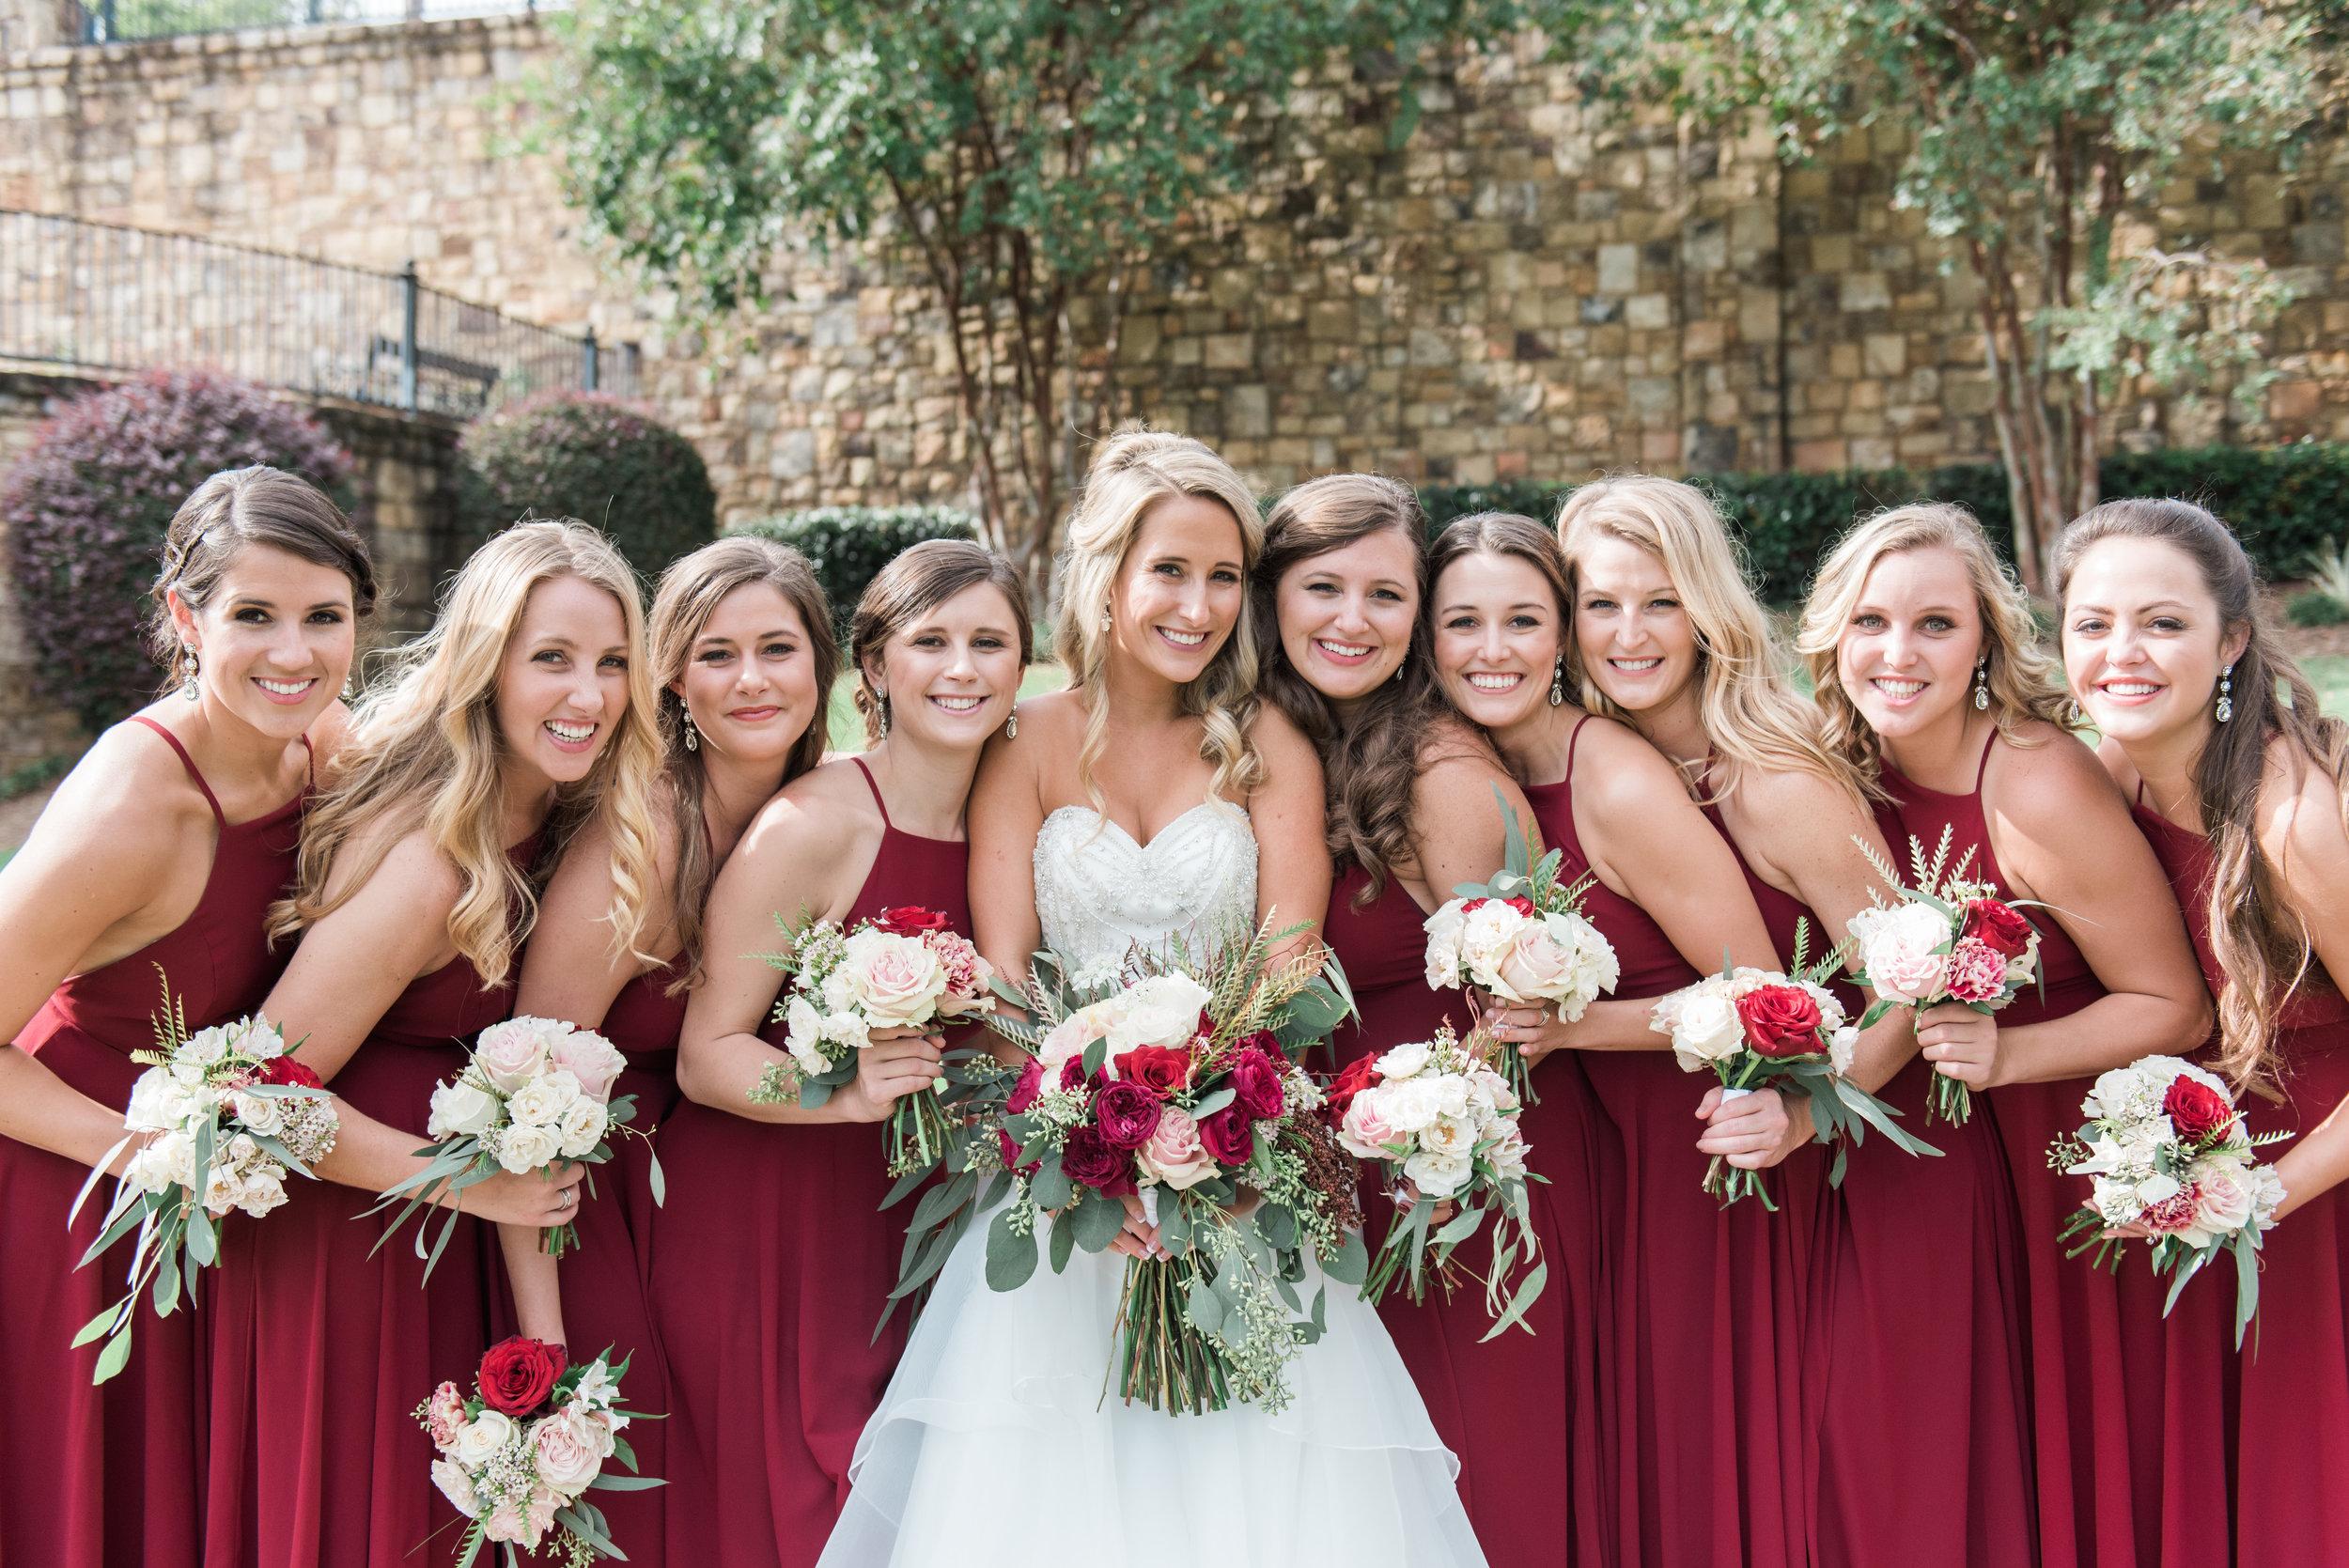 lillian webb park wedding photography